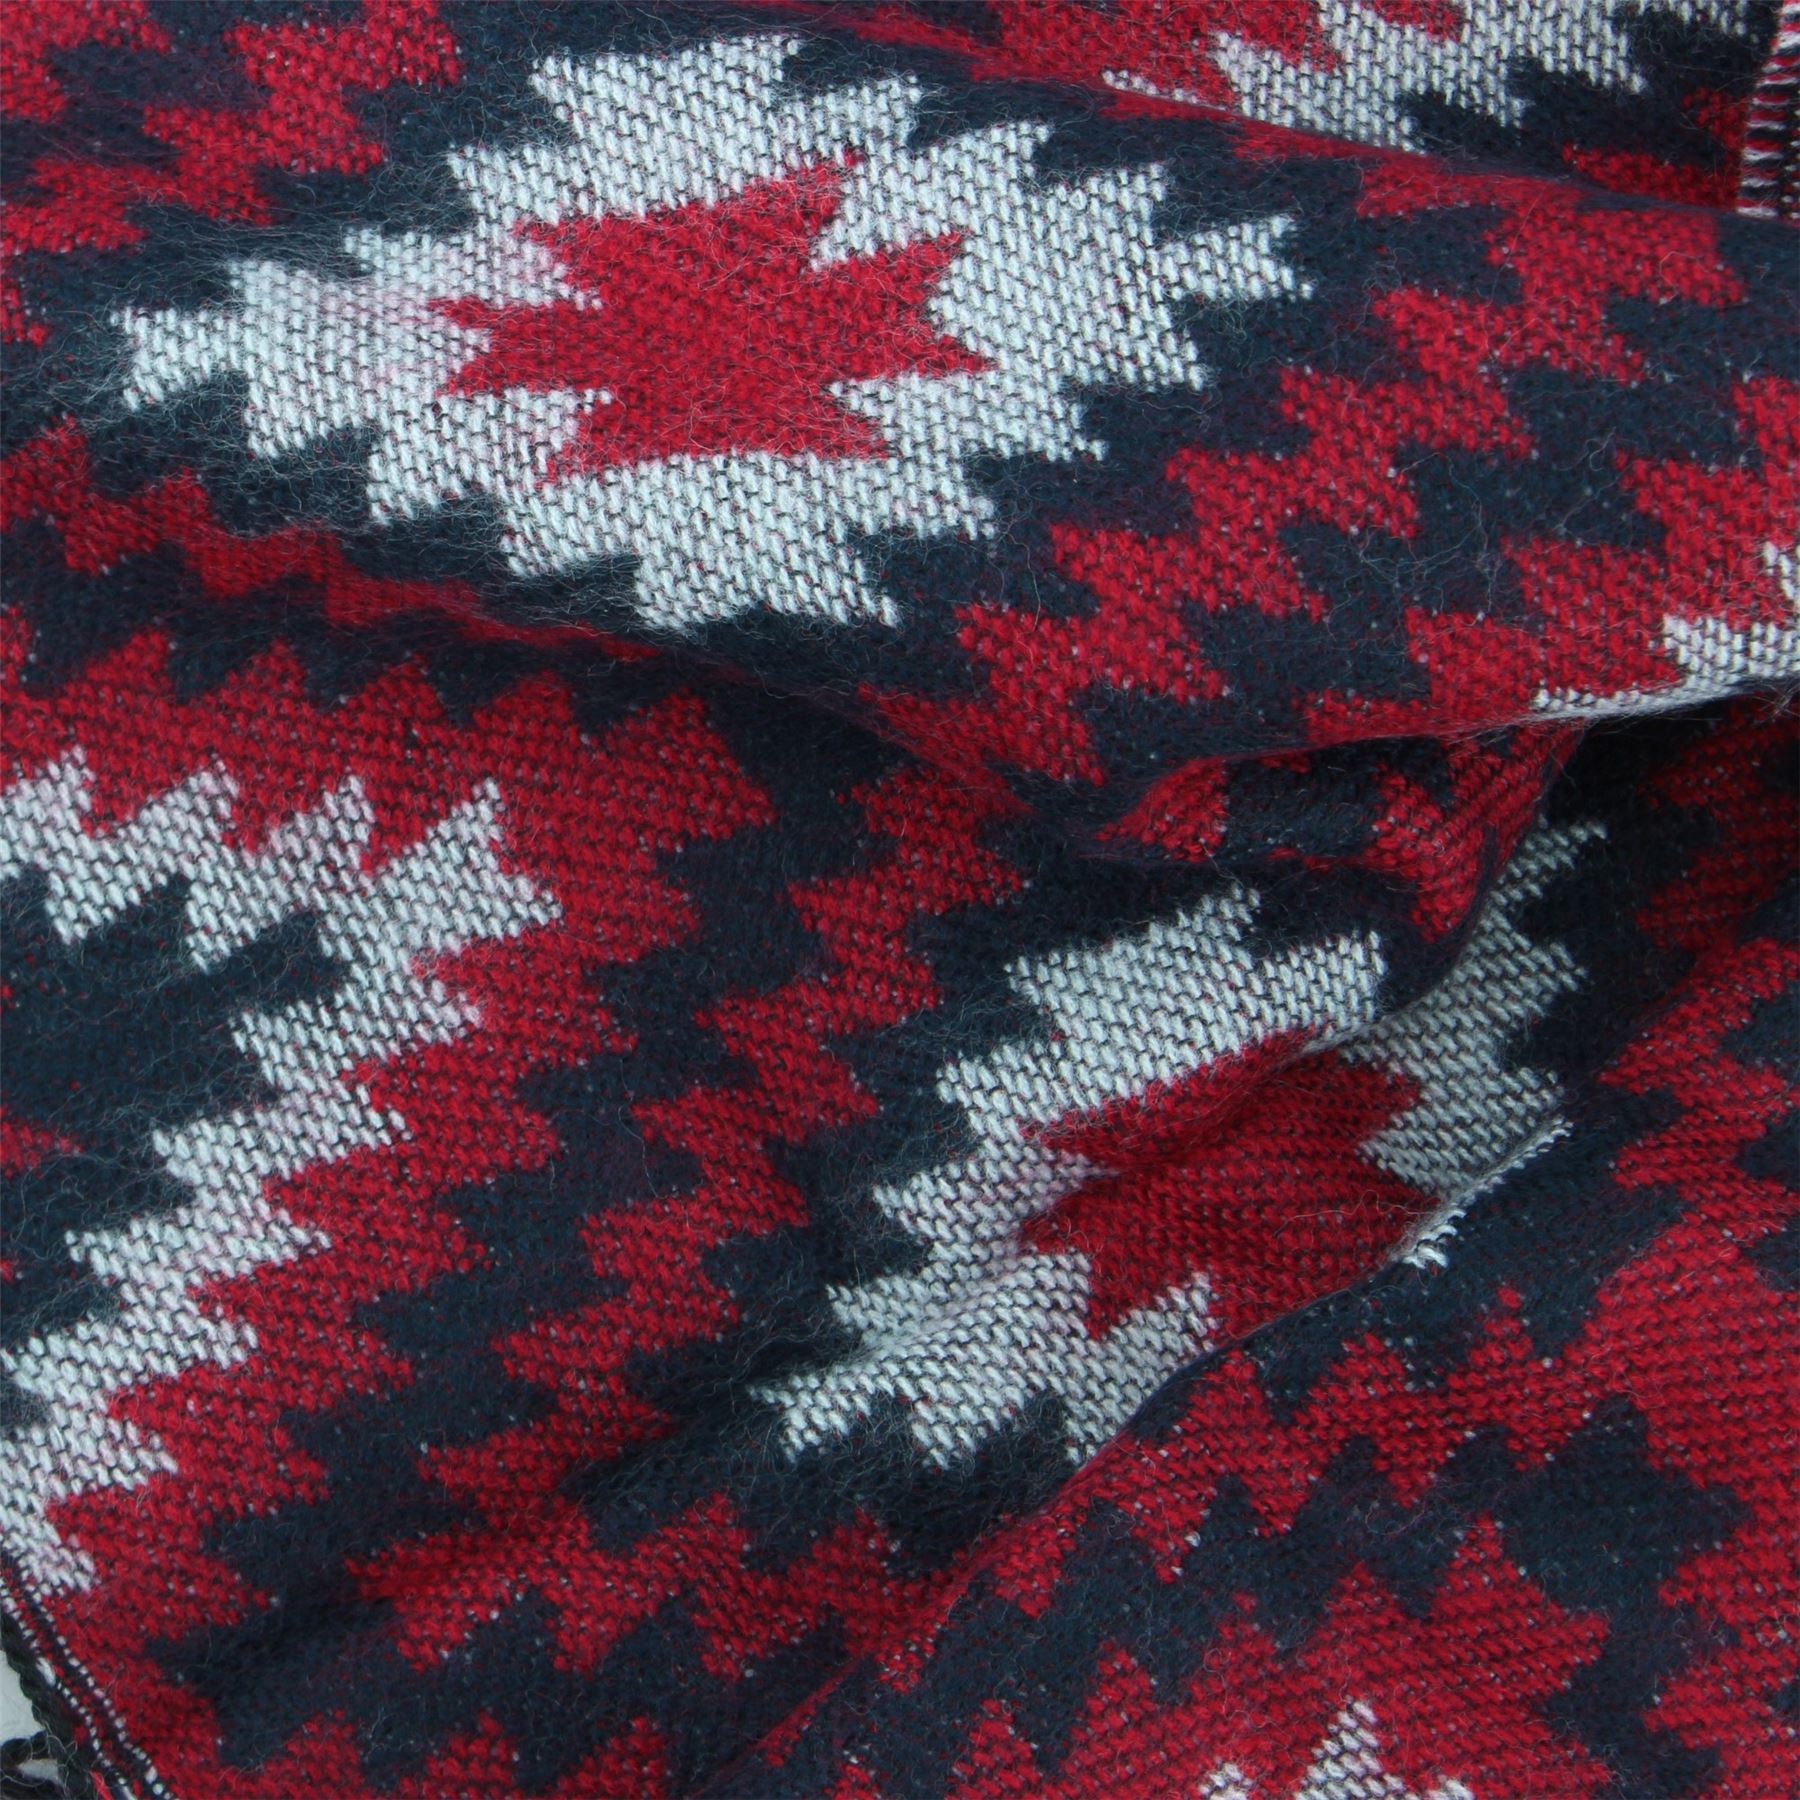 Cotton Scarf Thin Soft Zig Zag Woven BOHEMIA SWEDEN Ladies Lightweight